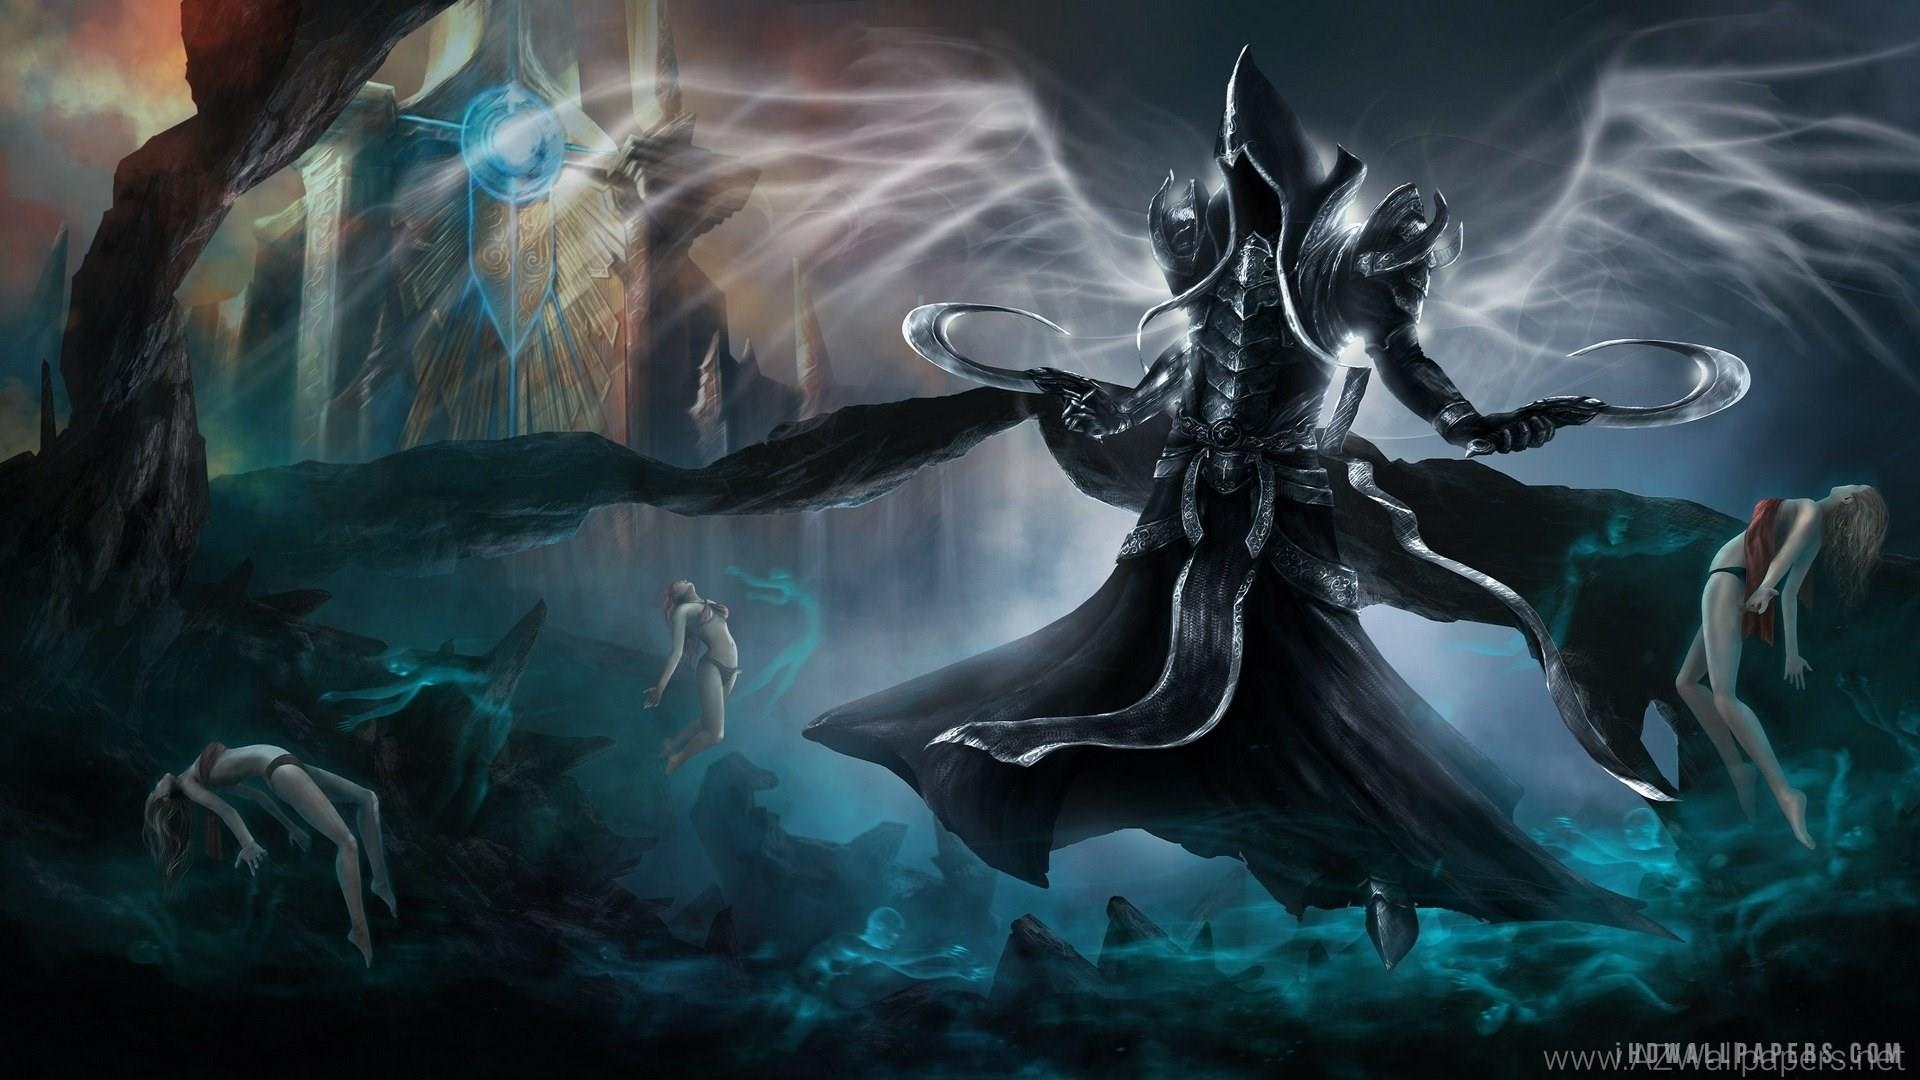 Diablo 3 Wallpaper 1920x1080